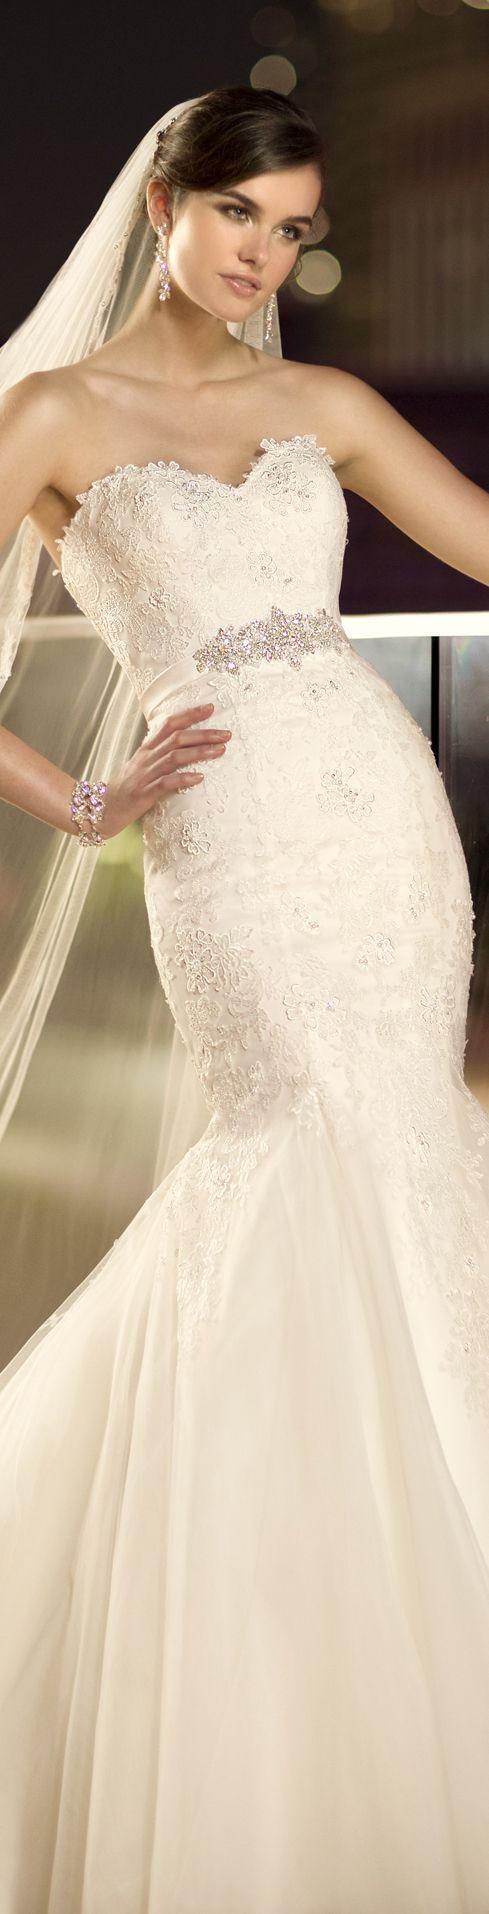 Essense of Australia D1441 #bride #wedding #dress